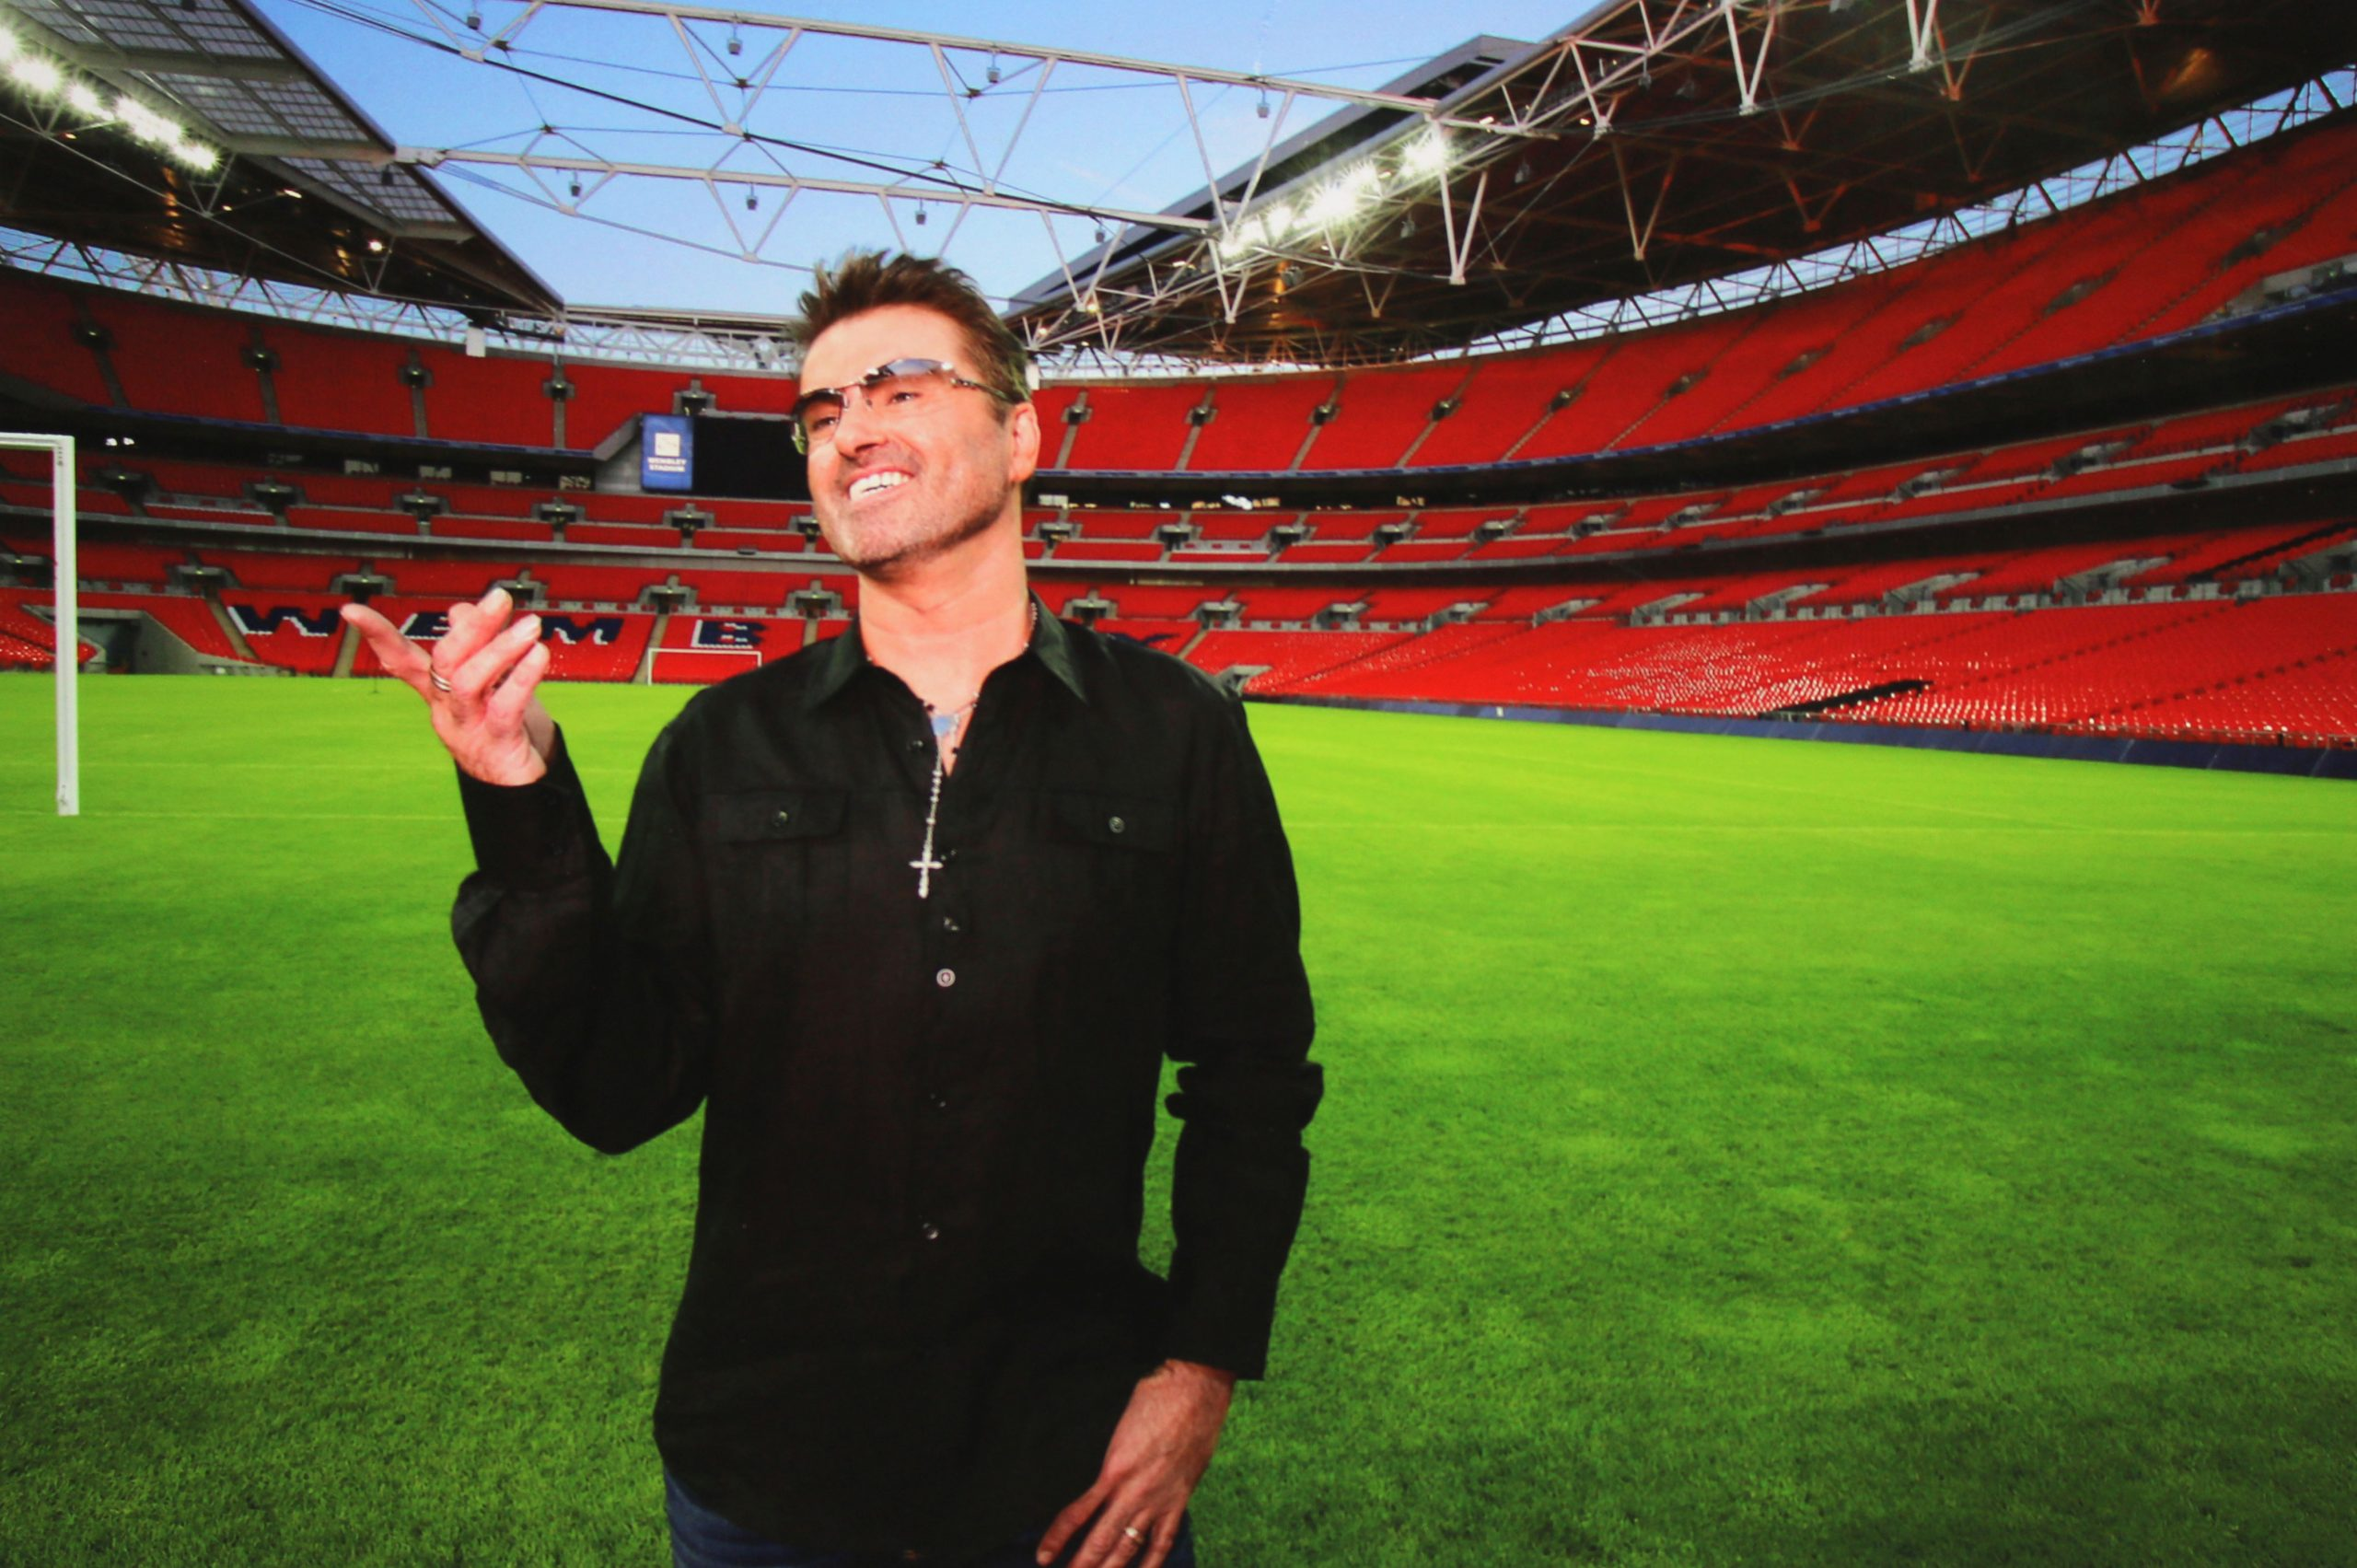 George Michael at Wembley